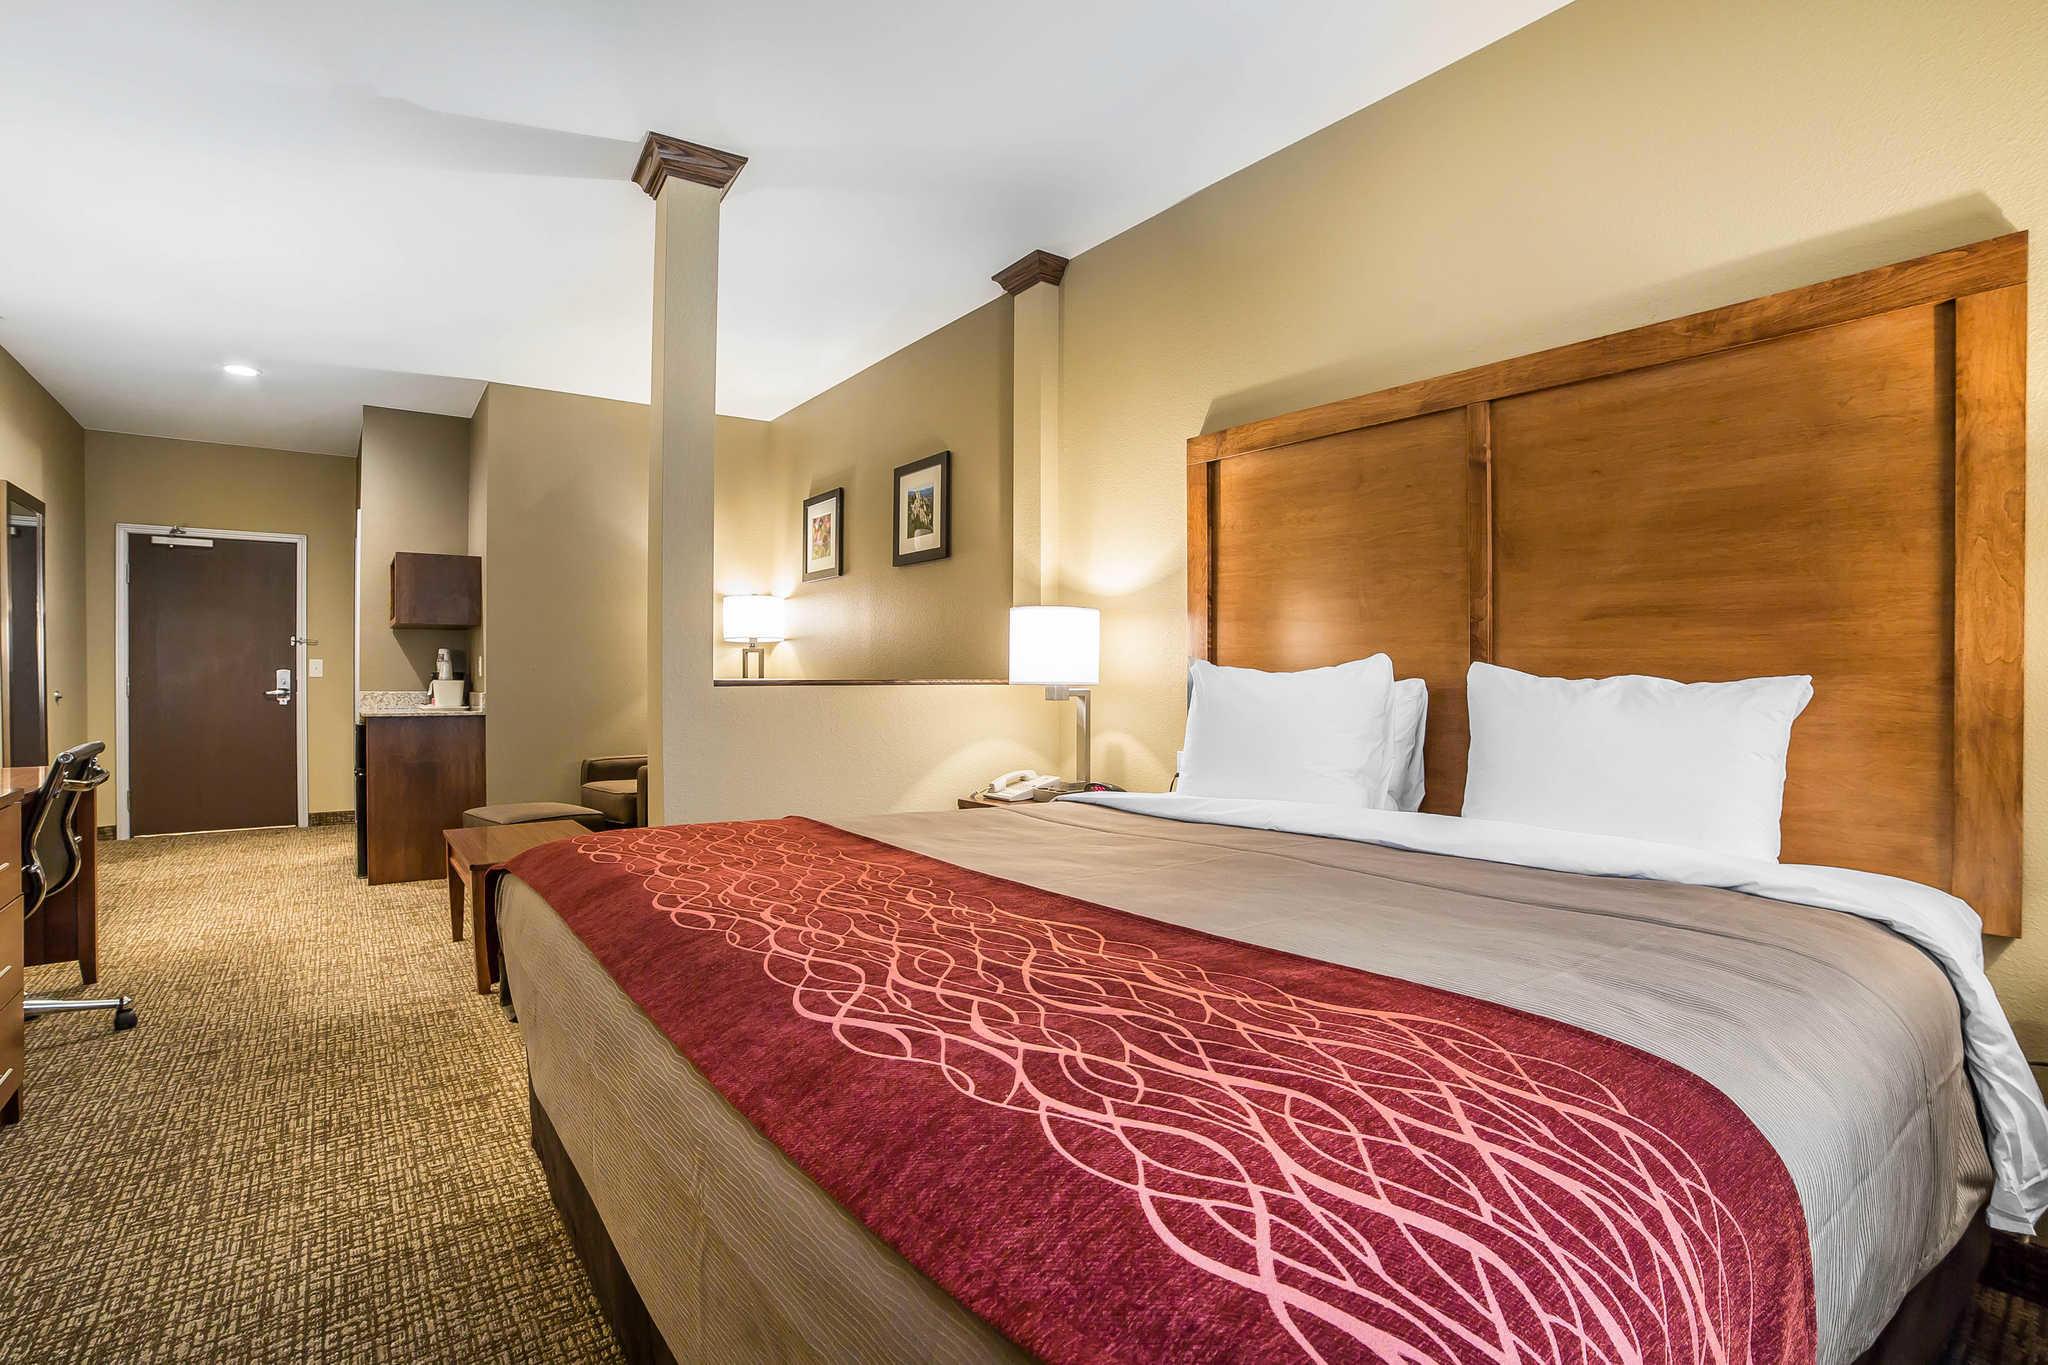 Comfort Inn & Suites Near Mt. Rushmore image 19